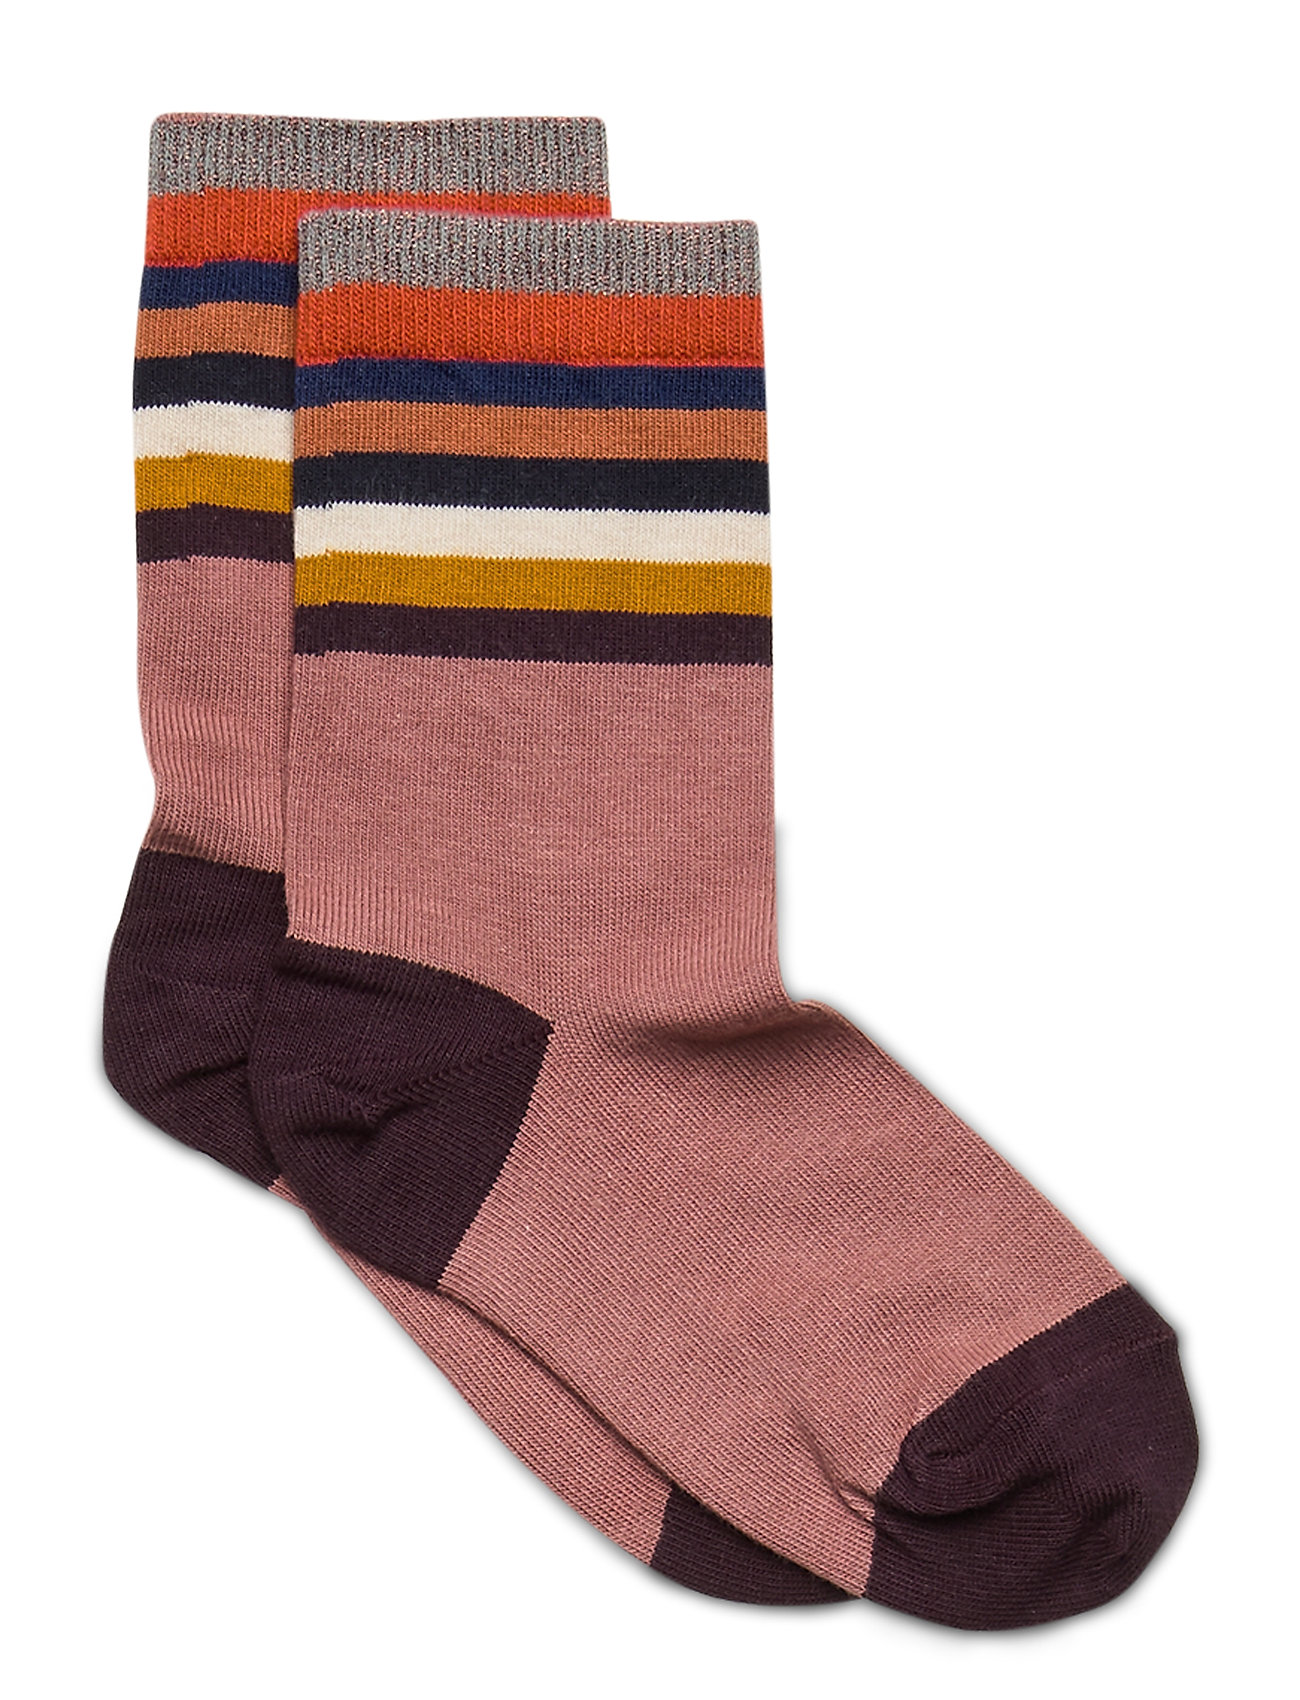 Image of Ankle Sock - Glitter Dots Sokker Strømper Brun Melton (3456635509)